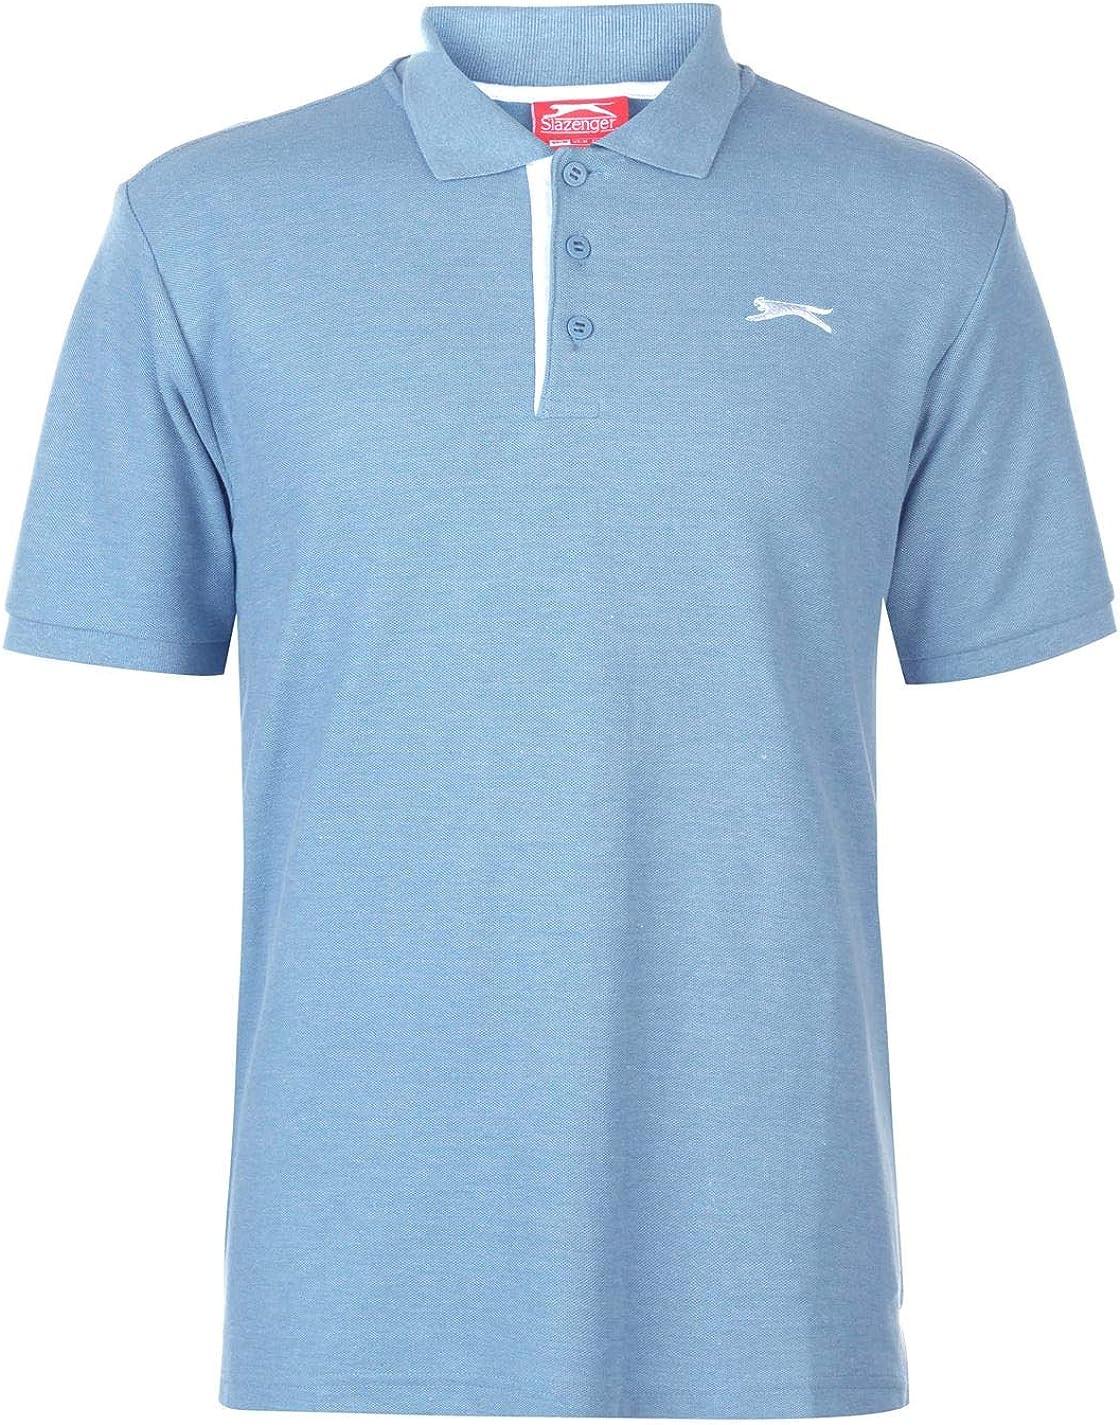 Slazenger Hombre Plain Camiseta Polo Denim Marga 3XL: Amazon.es ...